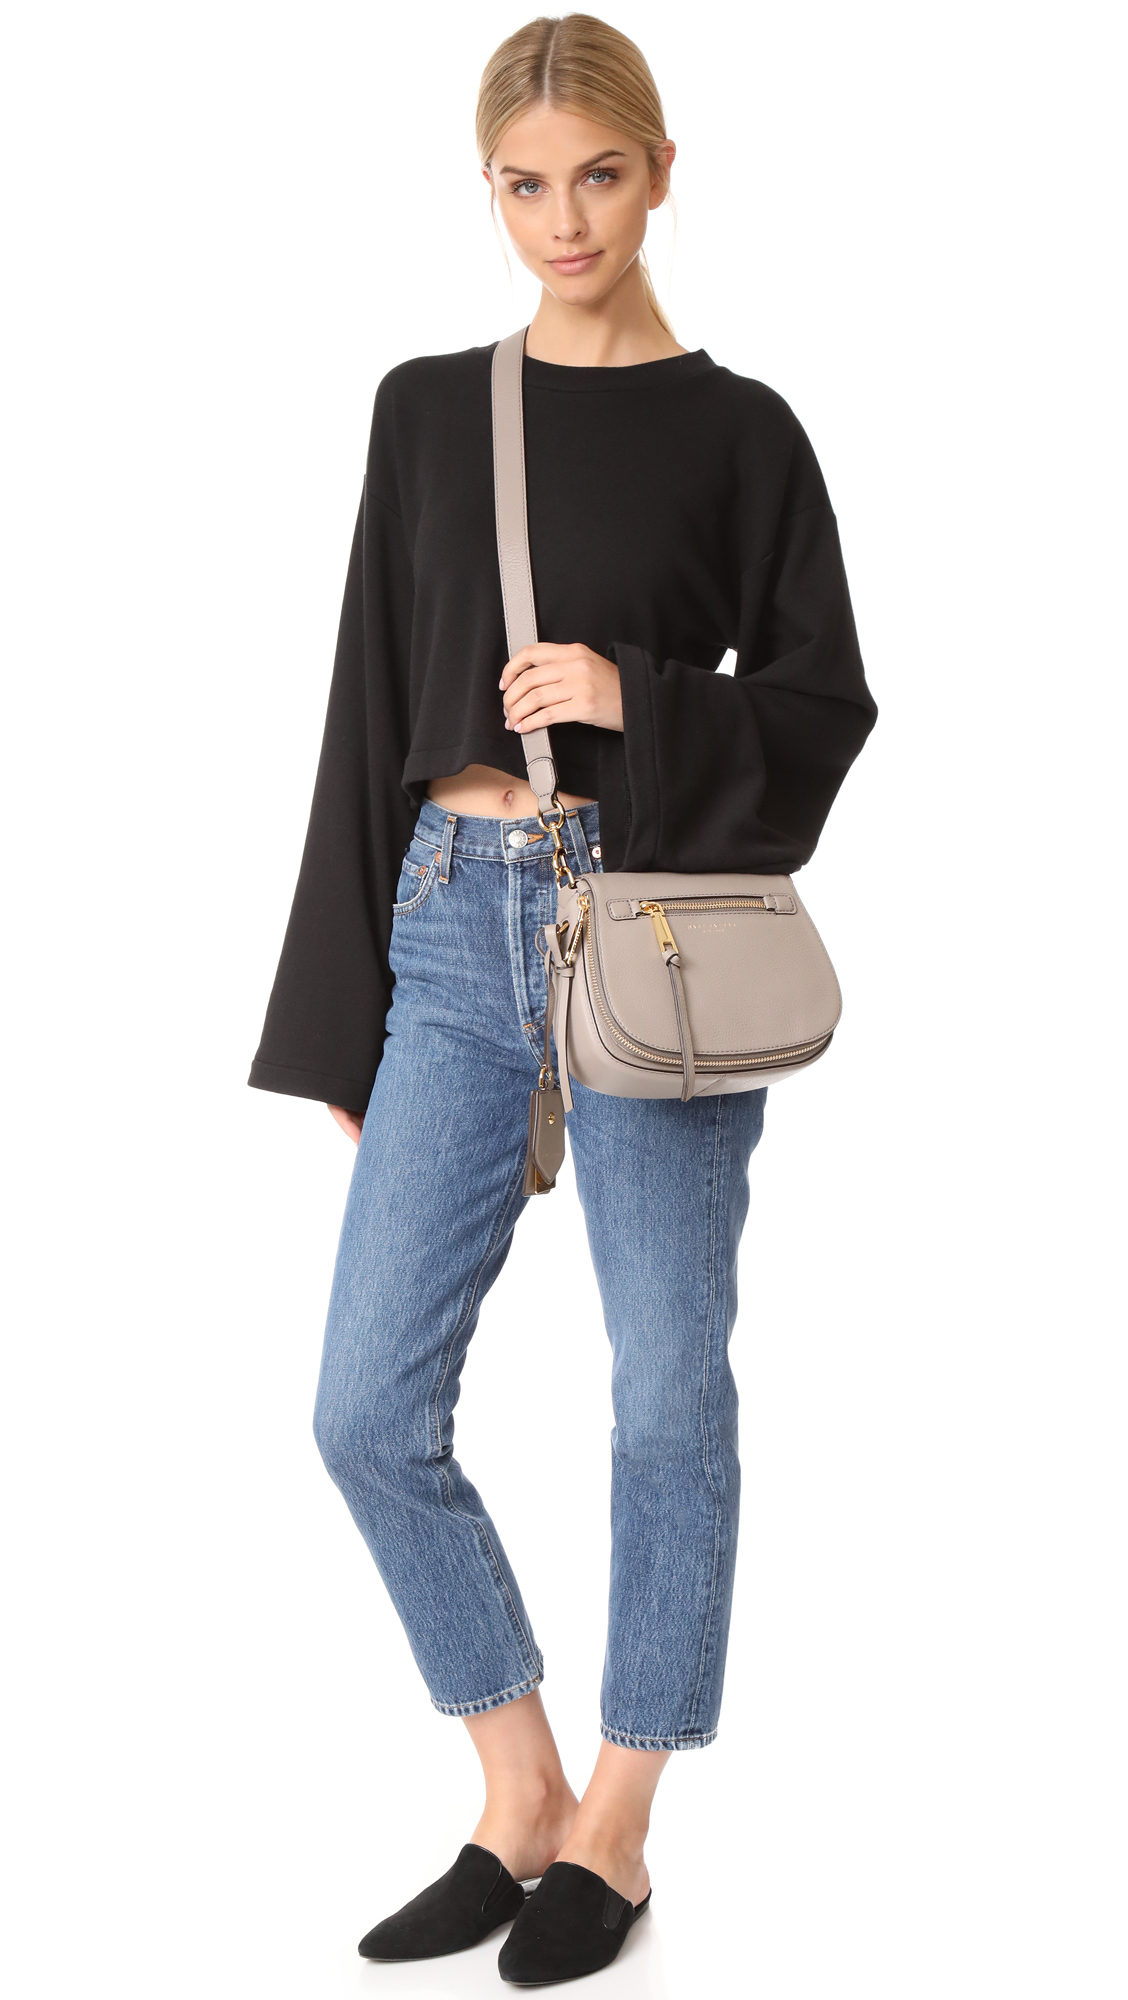 ca3e9525ff302 Marc Jacobs Recruit Small Saddle Bag